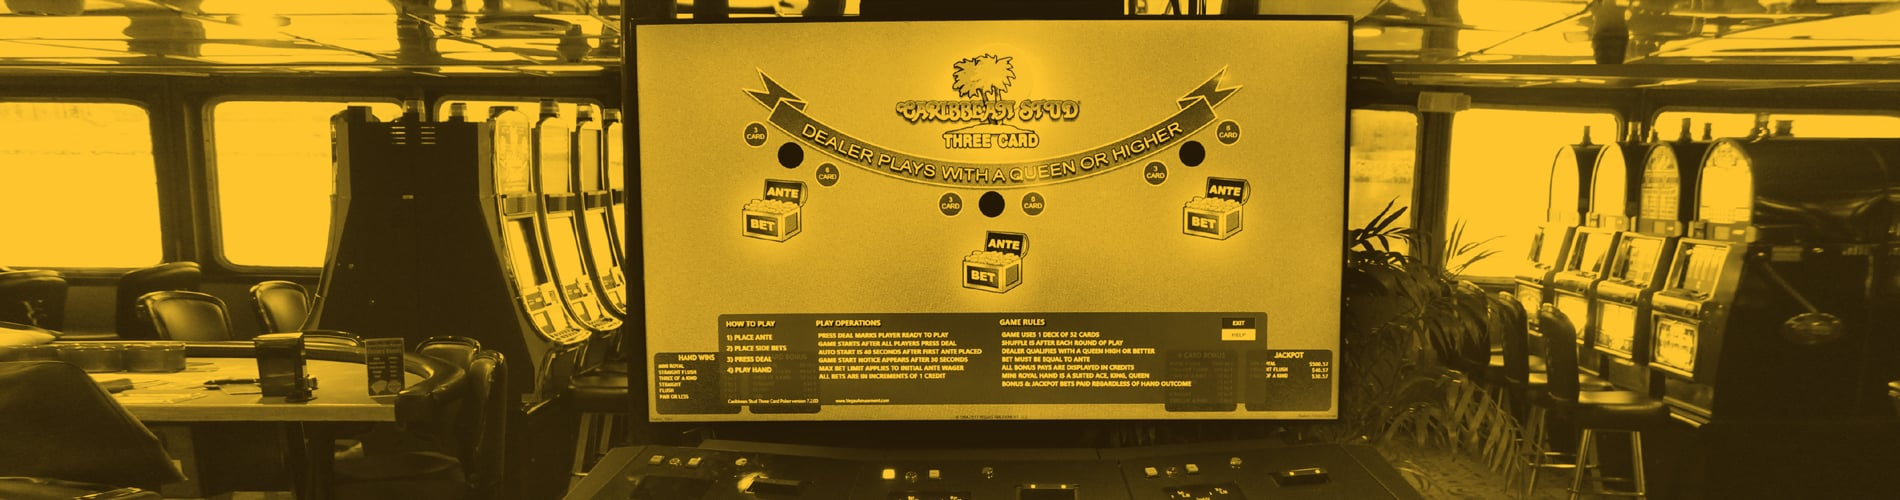 Electronic Caribbean Stud Poker | Victory Casino Cruises